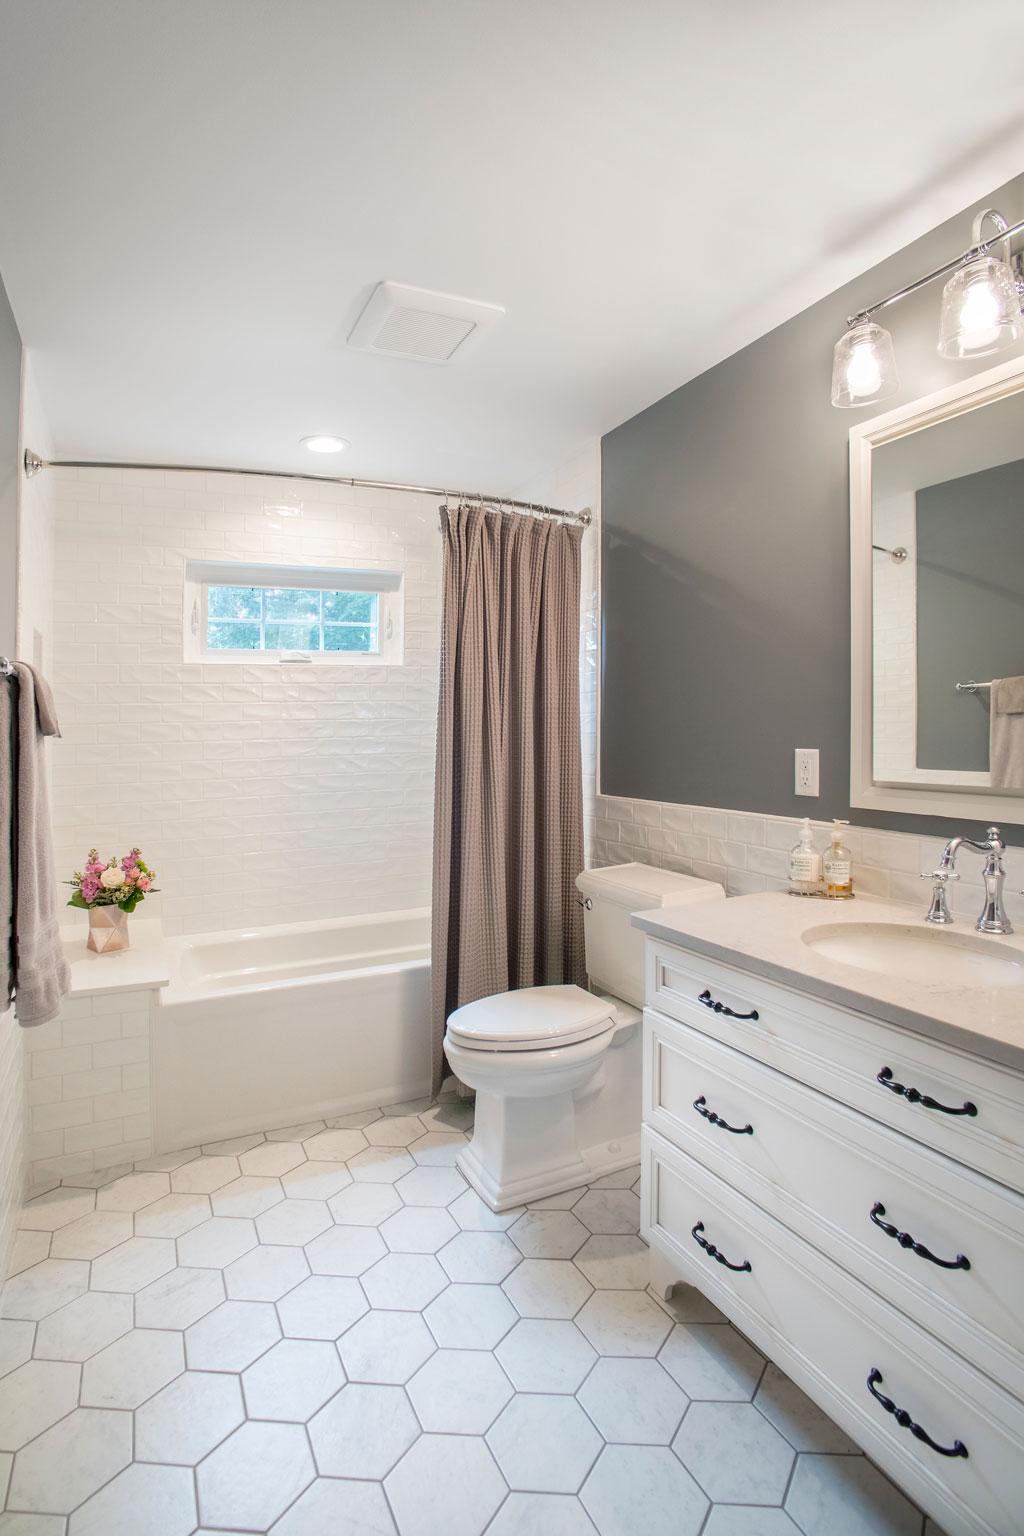 Roeser-Home-Remodeling-St-Louis-bathroom-remodel-Vollmer